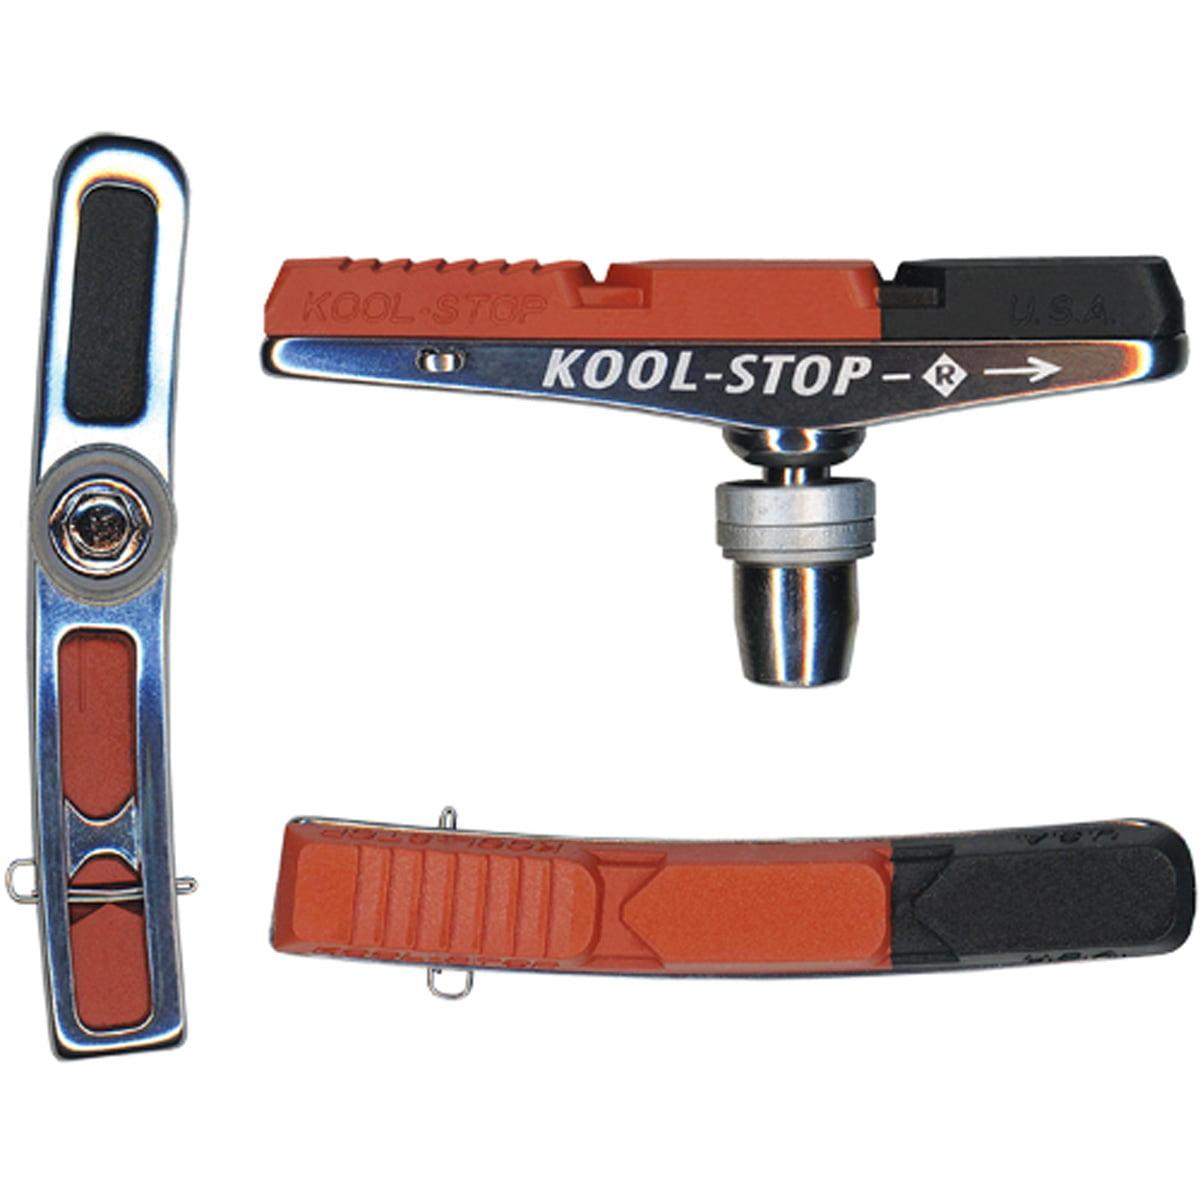 Kool-Stop V-Type 2 Dual Compound Bicycle Brake Pads - Red/Black - Pair - KS-VBH2